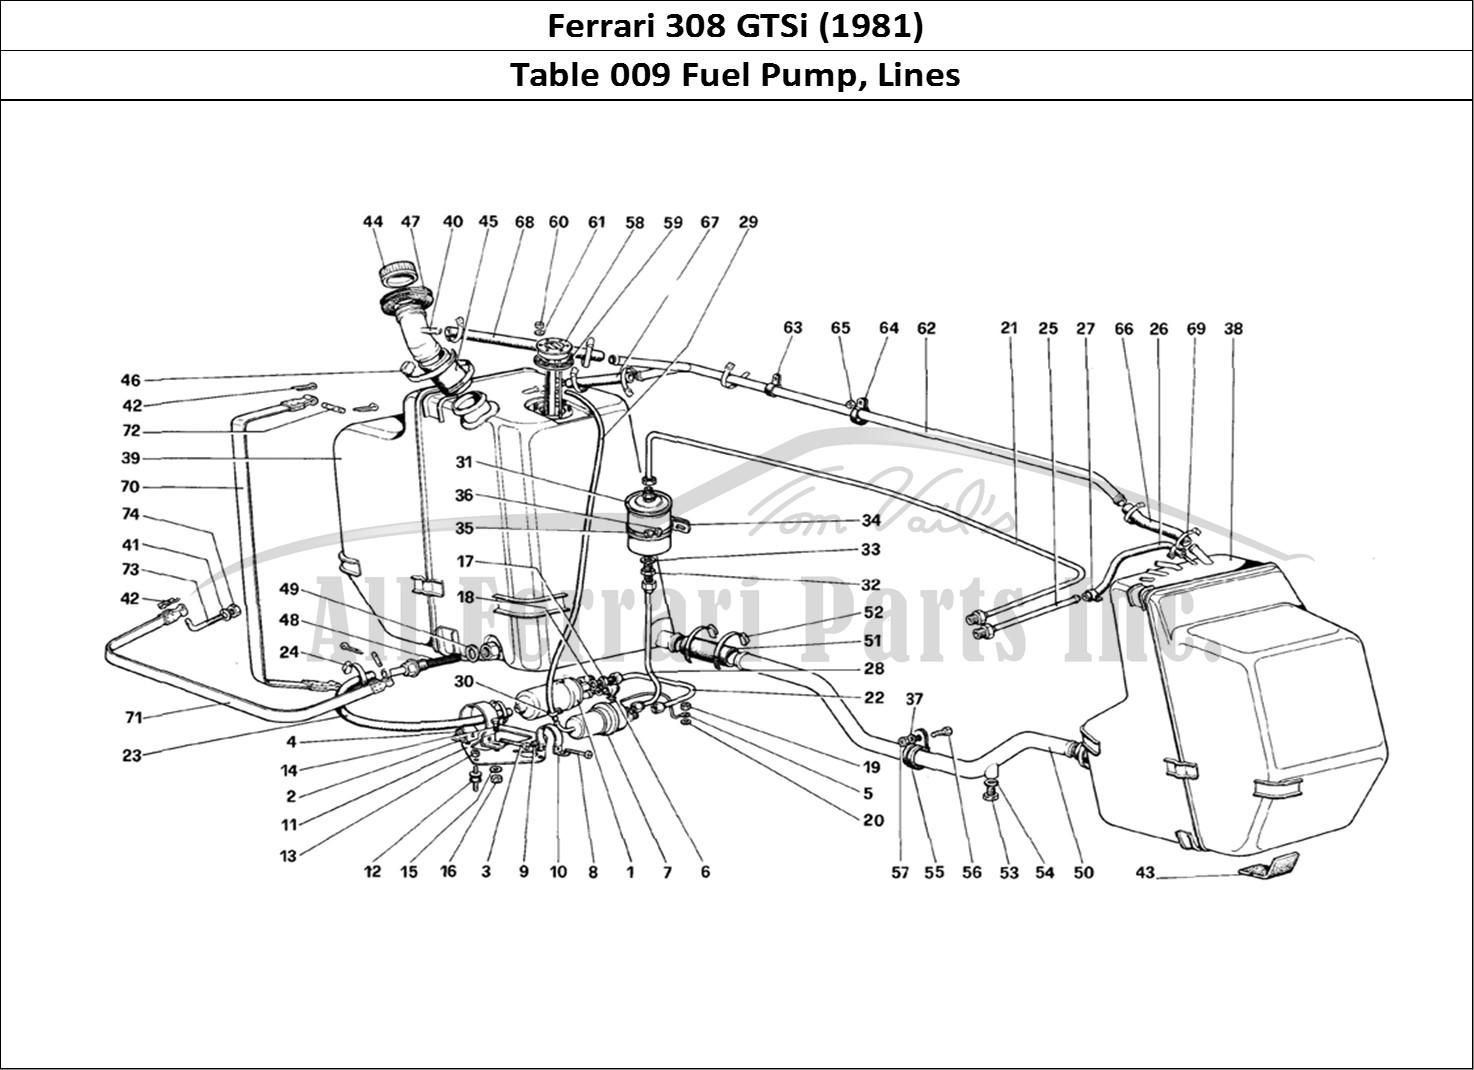 Buy original Ferrari 308 GTSi (1981) 009 Fuel Pump, Lines